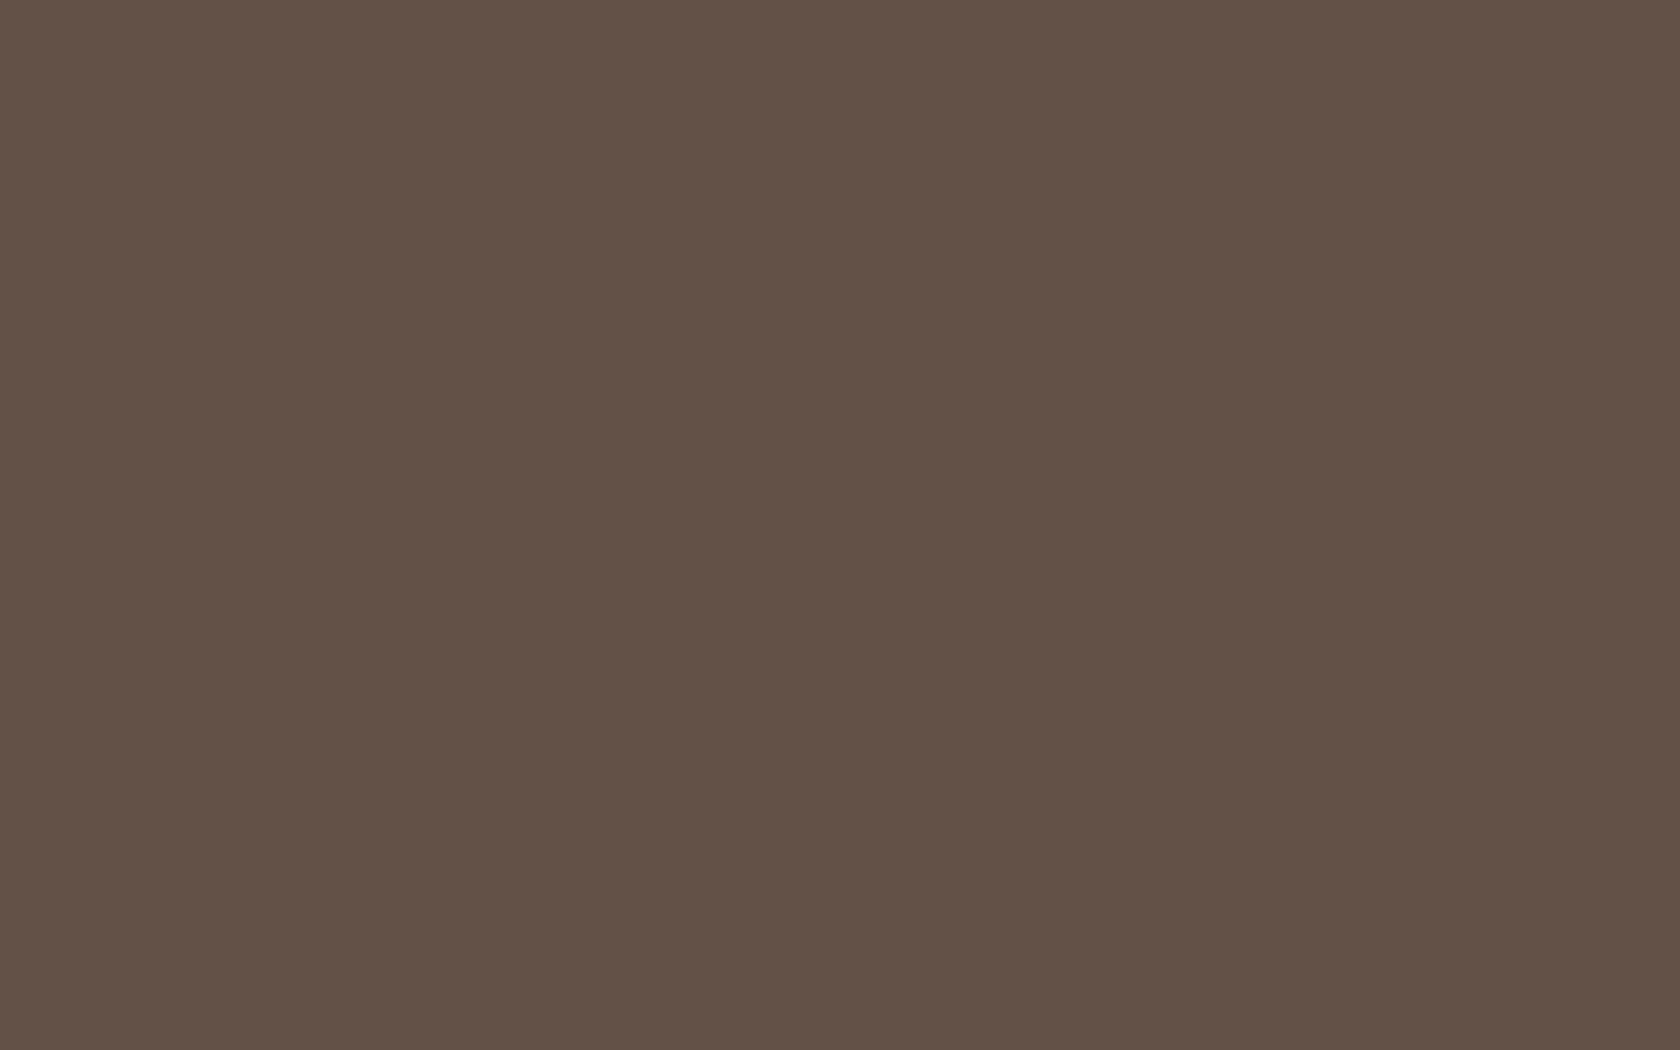 1680x1050 Umber Solid Color Background